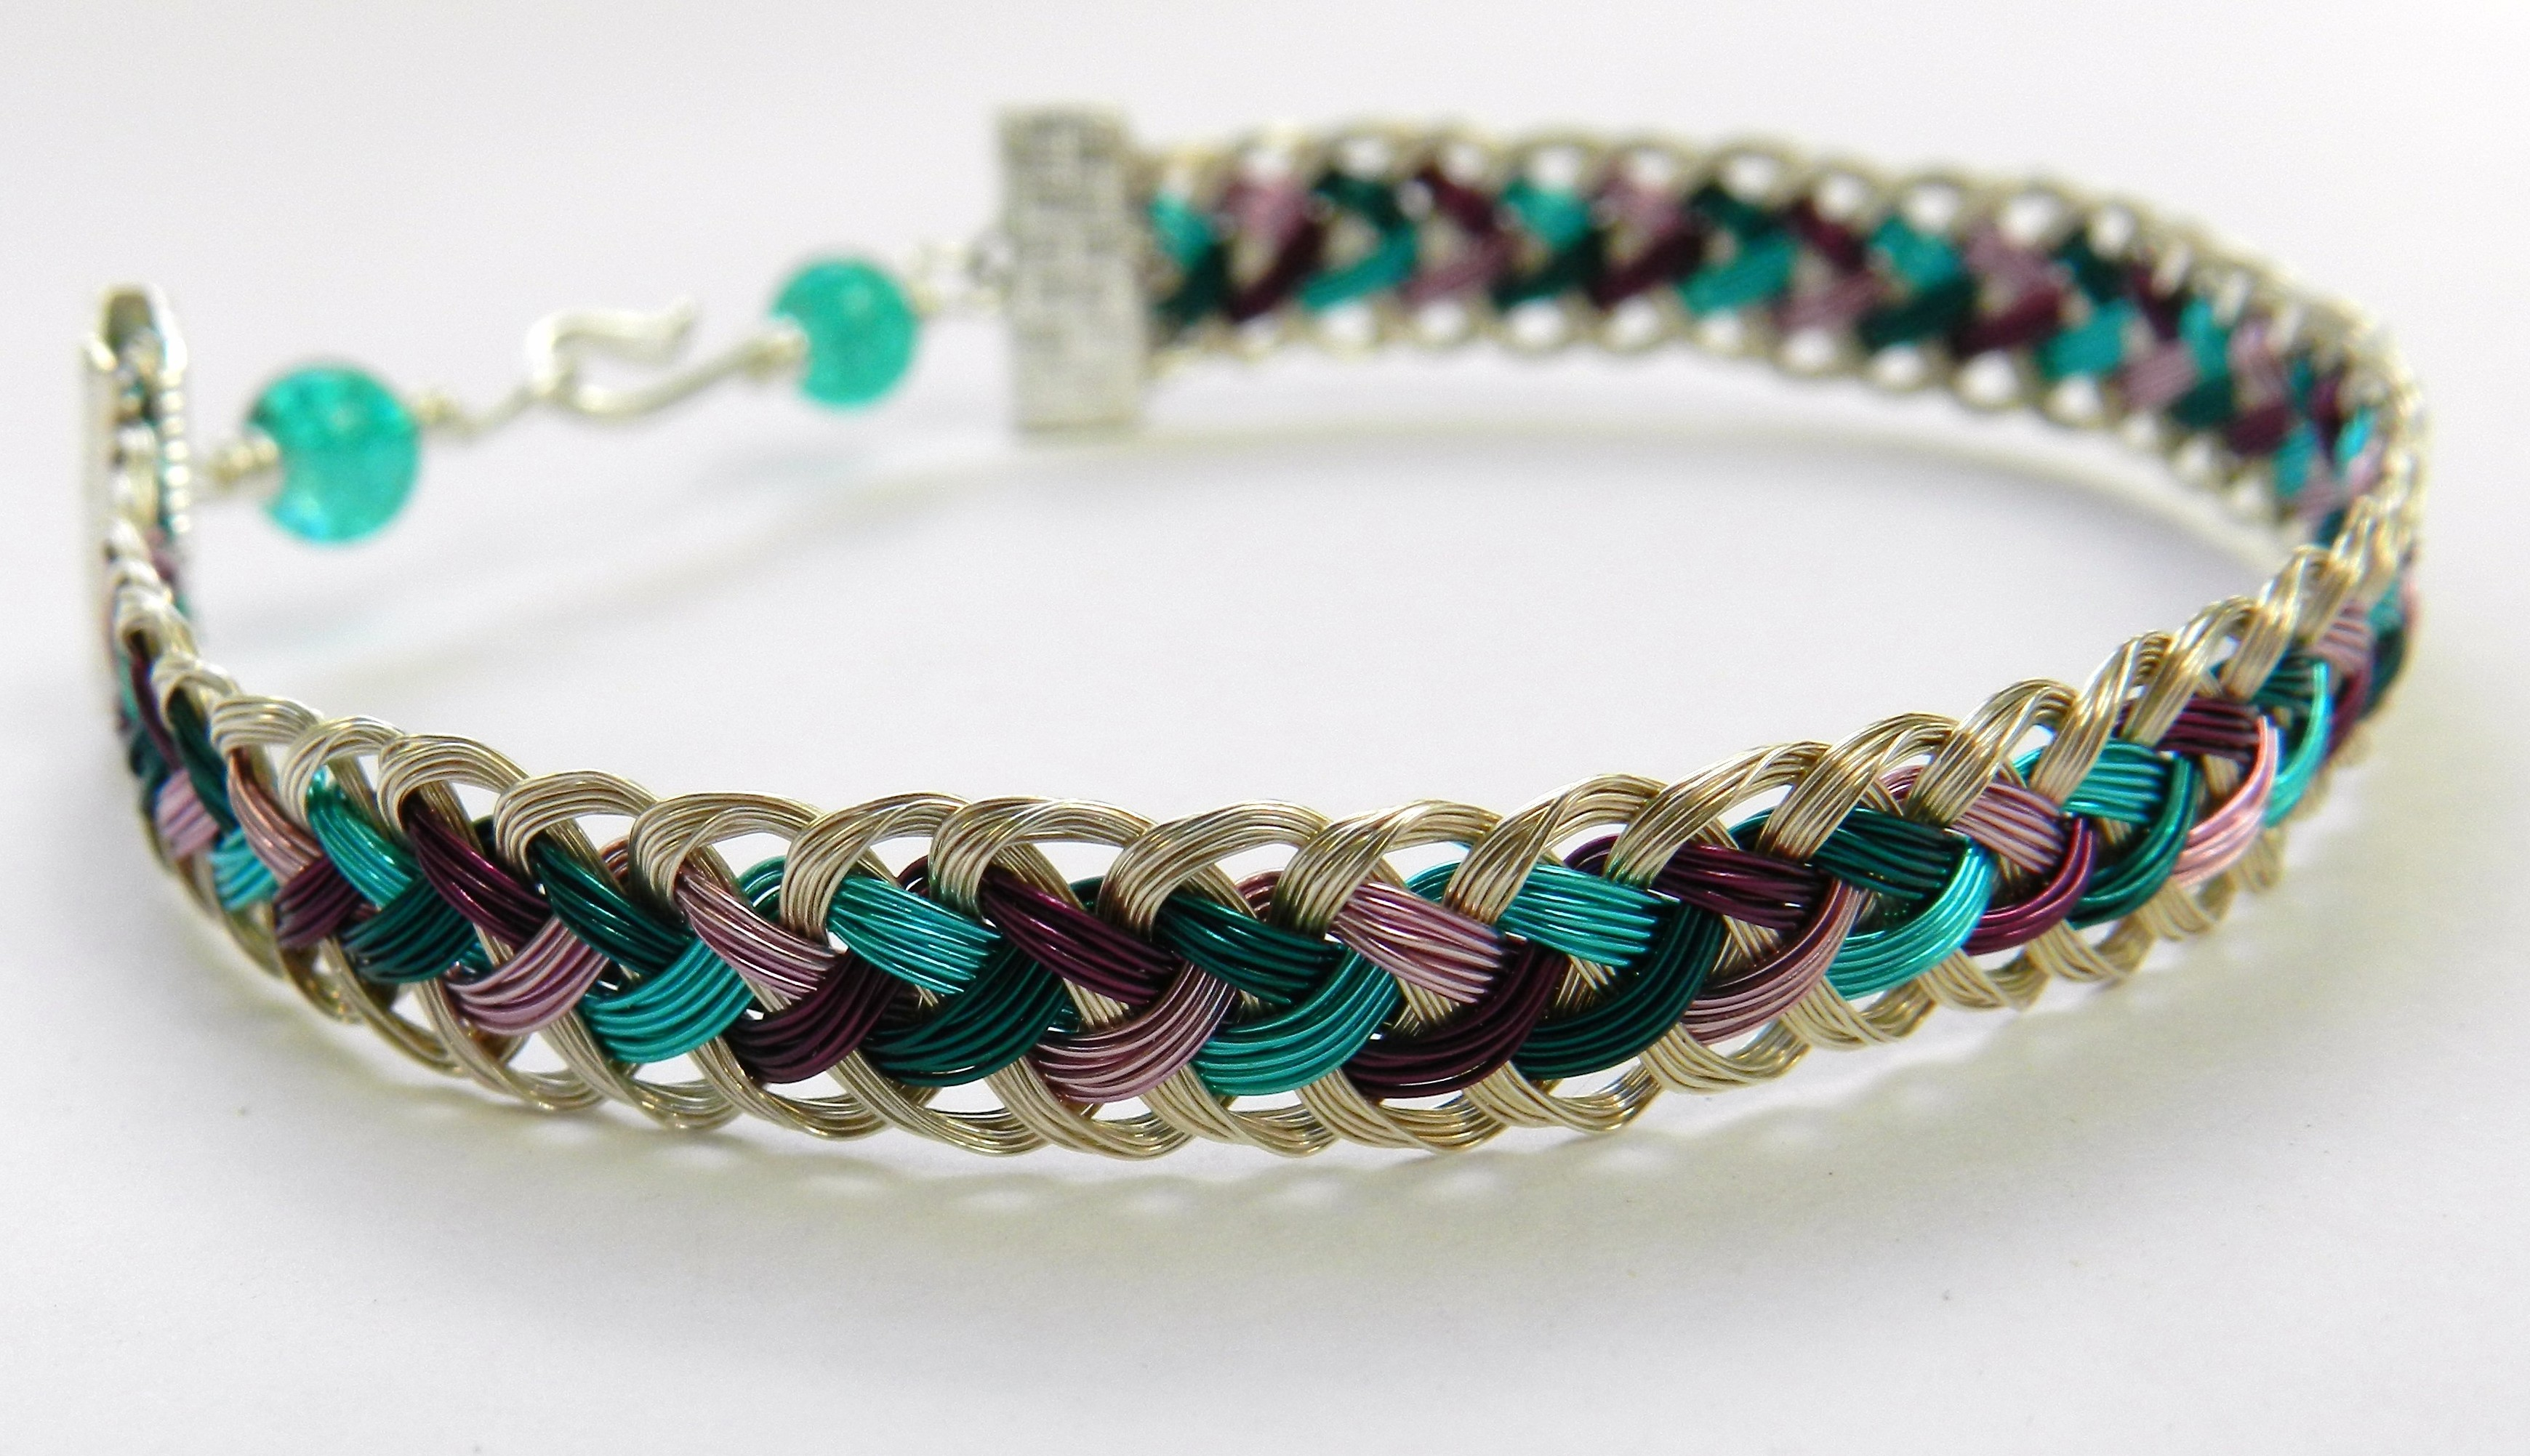 Ihimo Half Round Braid Wire Bracelet